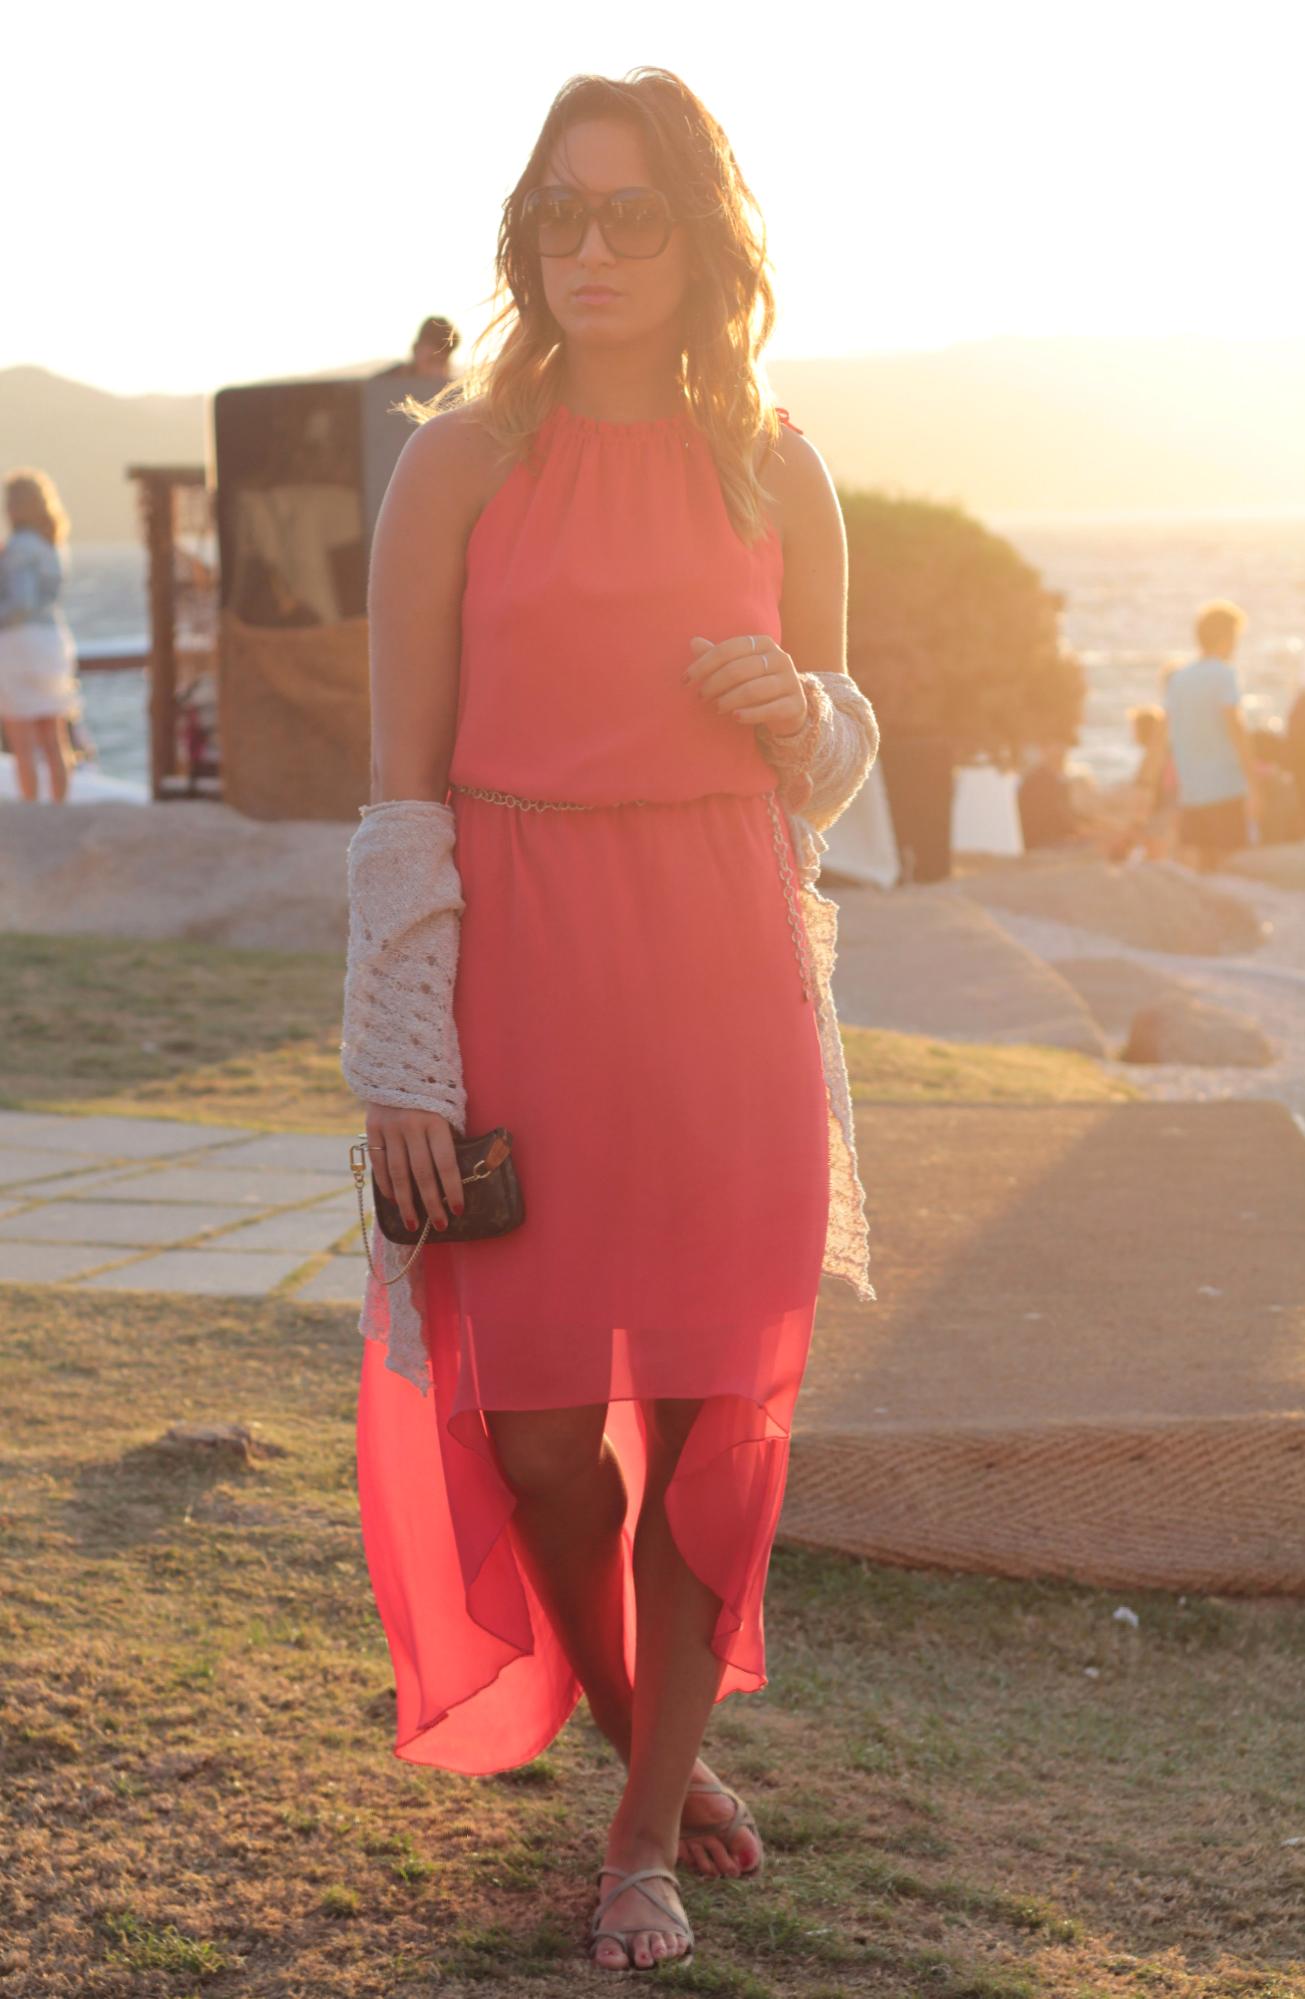 my glamour attitude fashion blog, maria giovanna abagnale, phi beach sardegna, costa smeralda, porto cervo, summer 2014, outfit, kocca, dress, sunset, moda, fashion